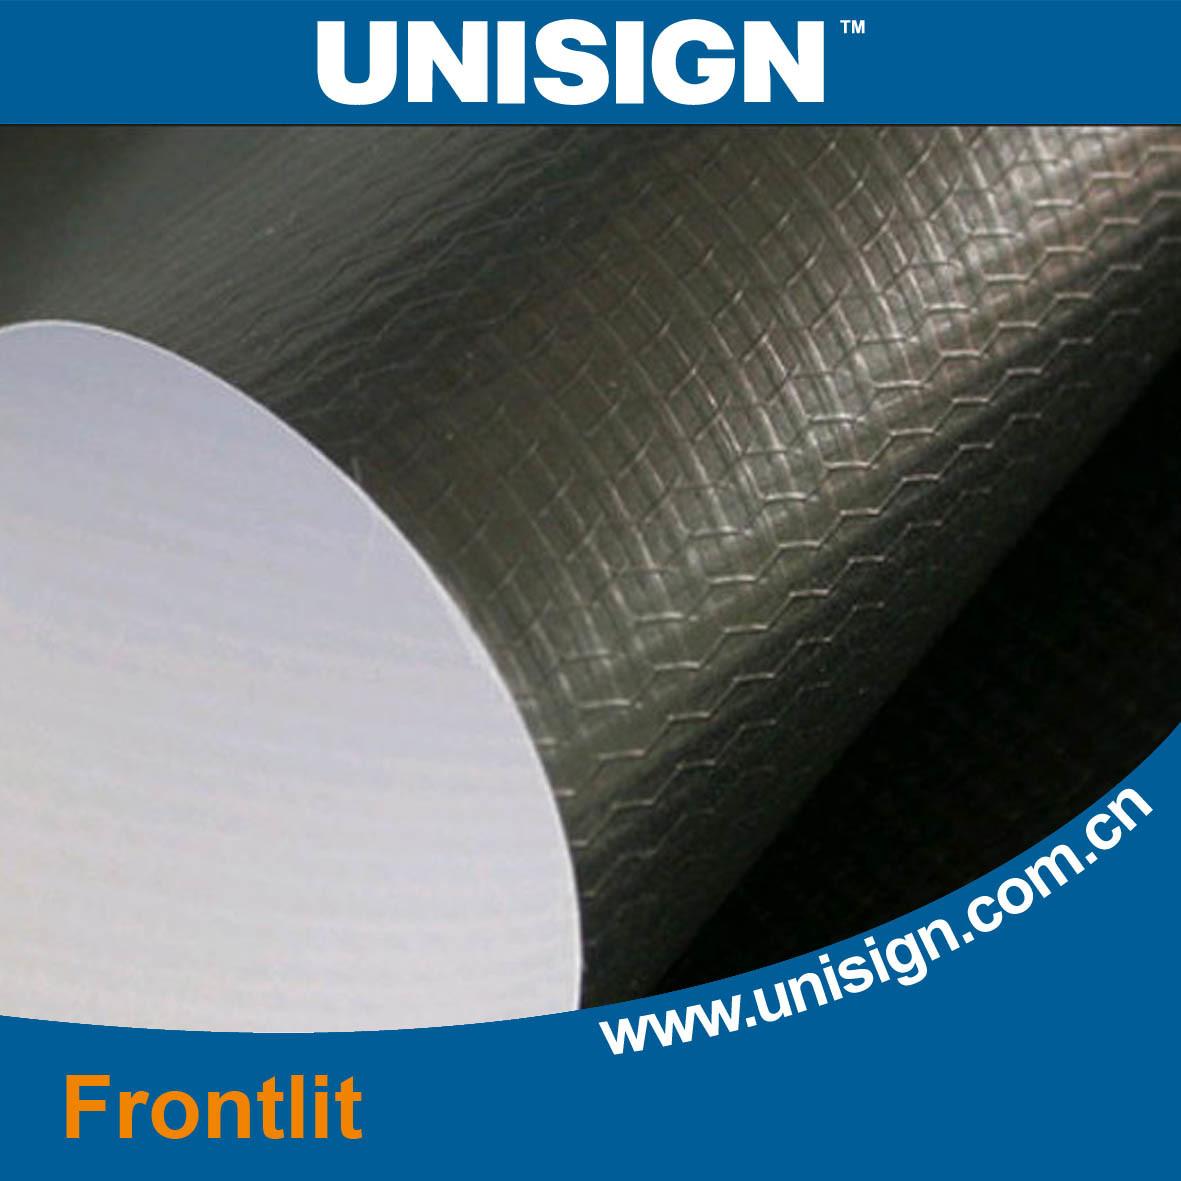 Laminated Frontlight Flex Banner for Digital Printing